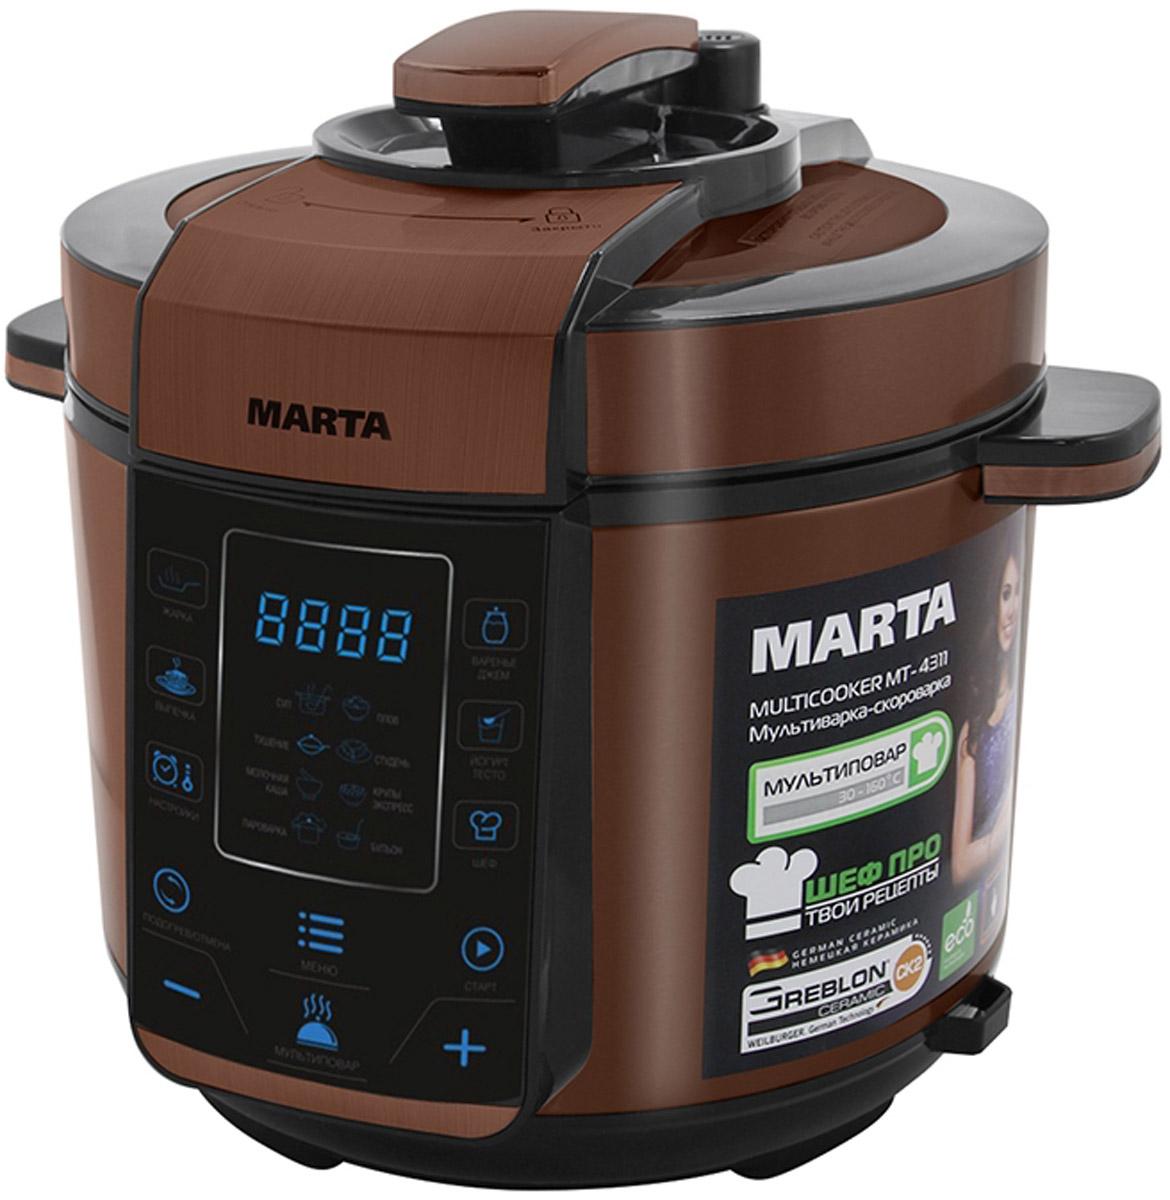 Marta MT-4311, Black Cooper мультиварка мультиварка мастер шеф редмонд